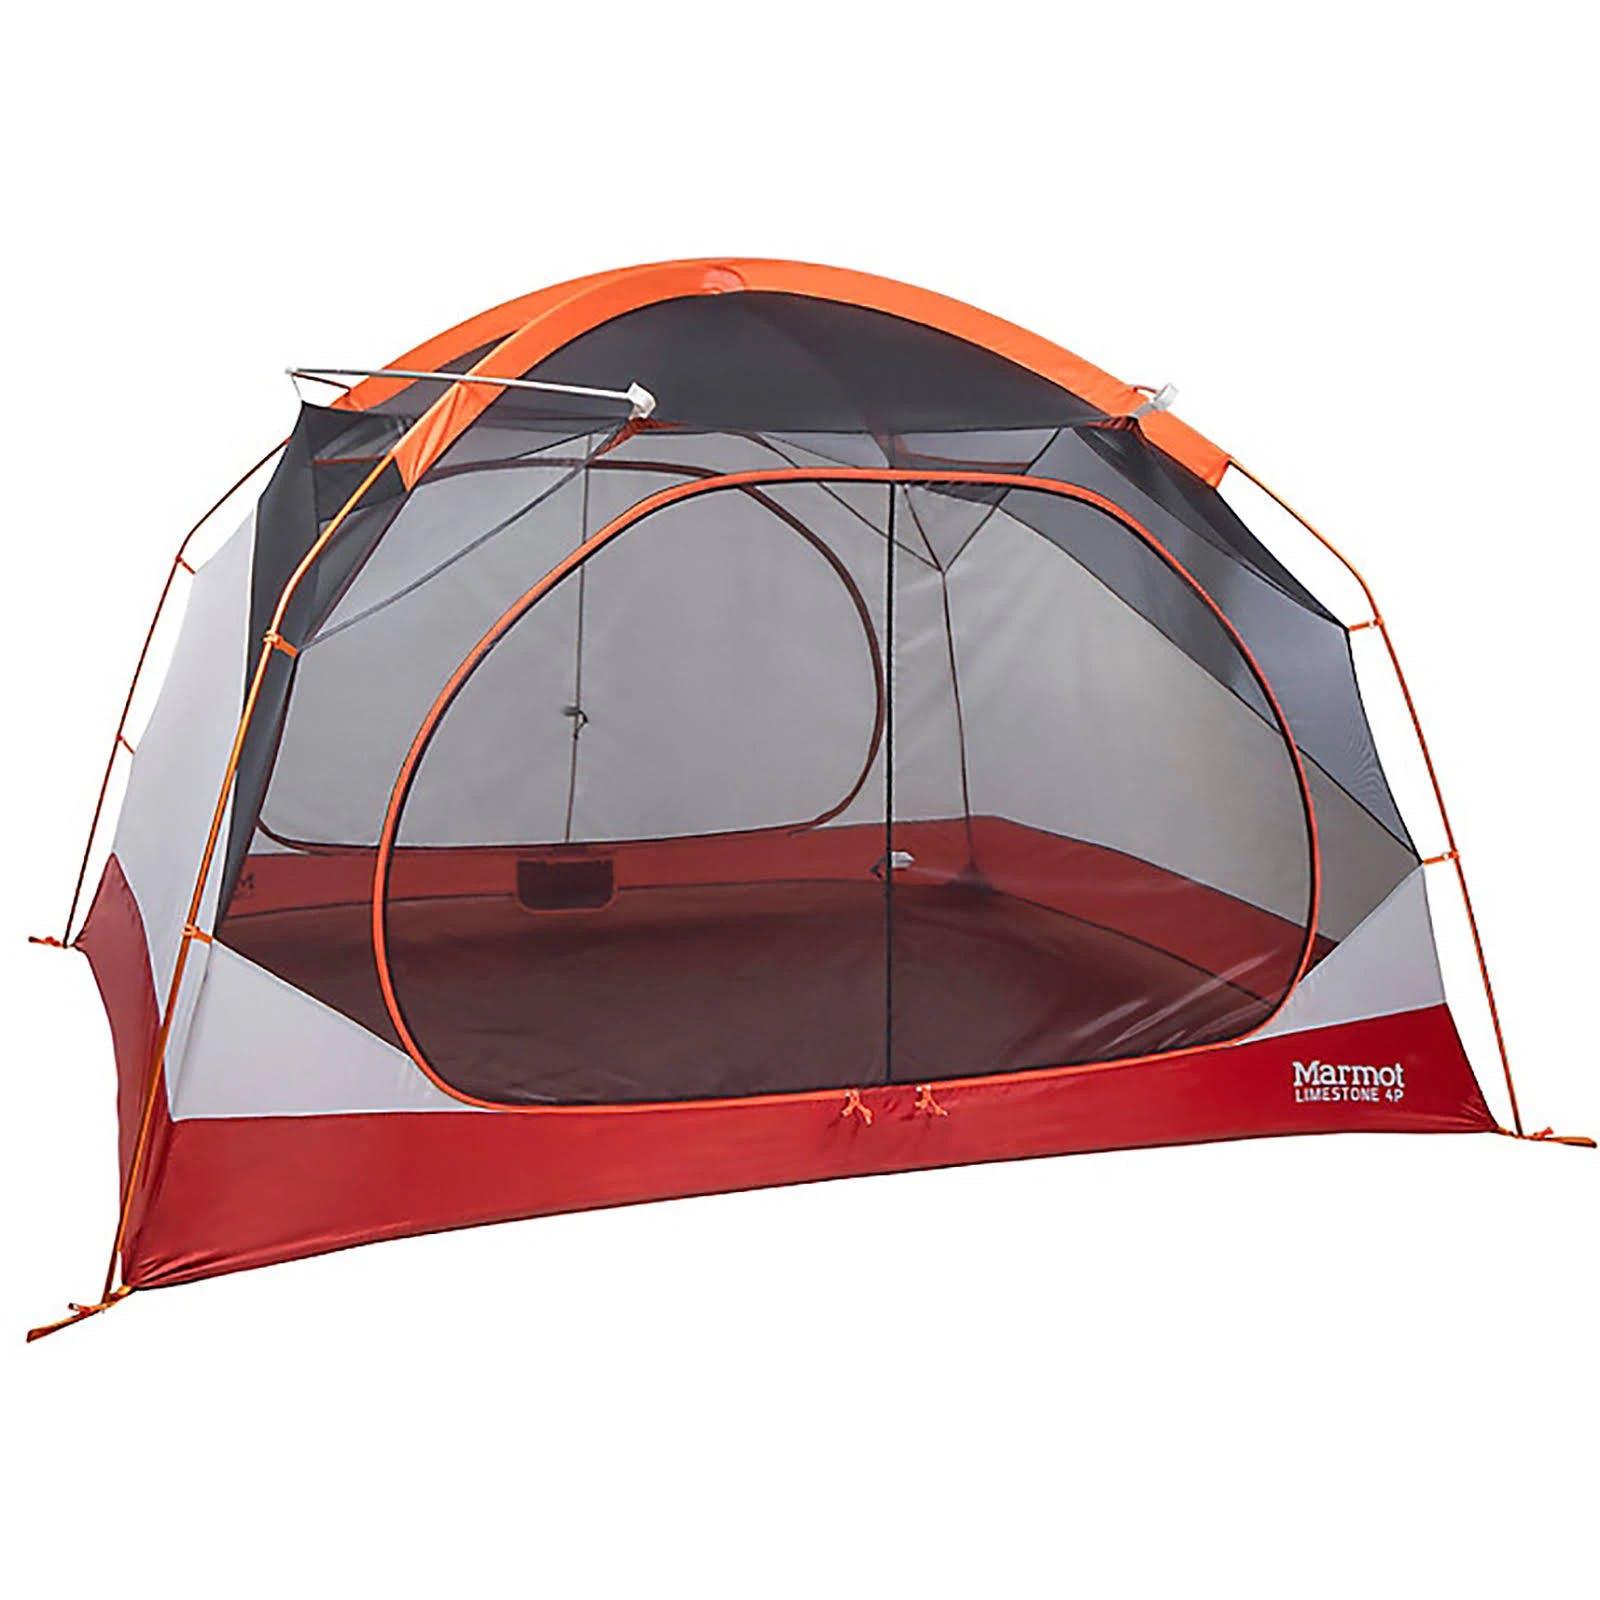 Marmot Limestone 4p Tent - Orange Spice Arona